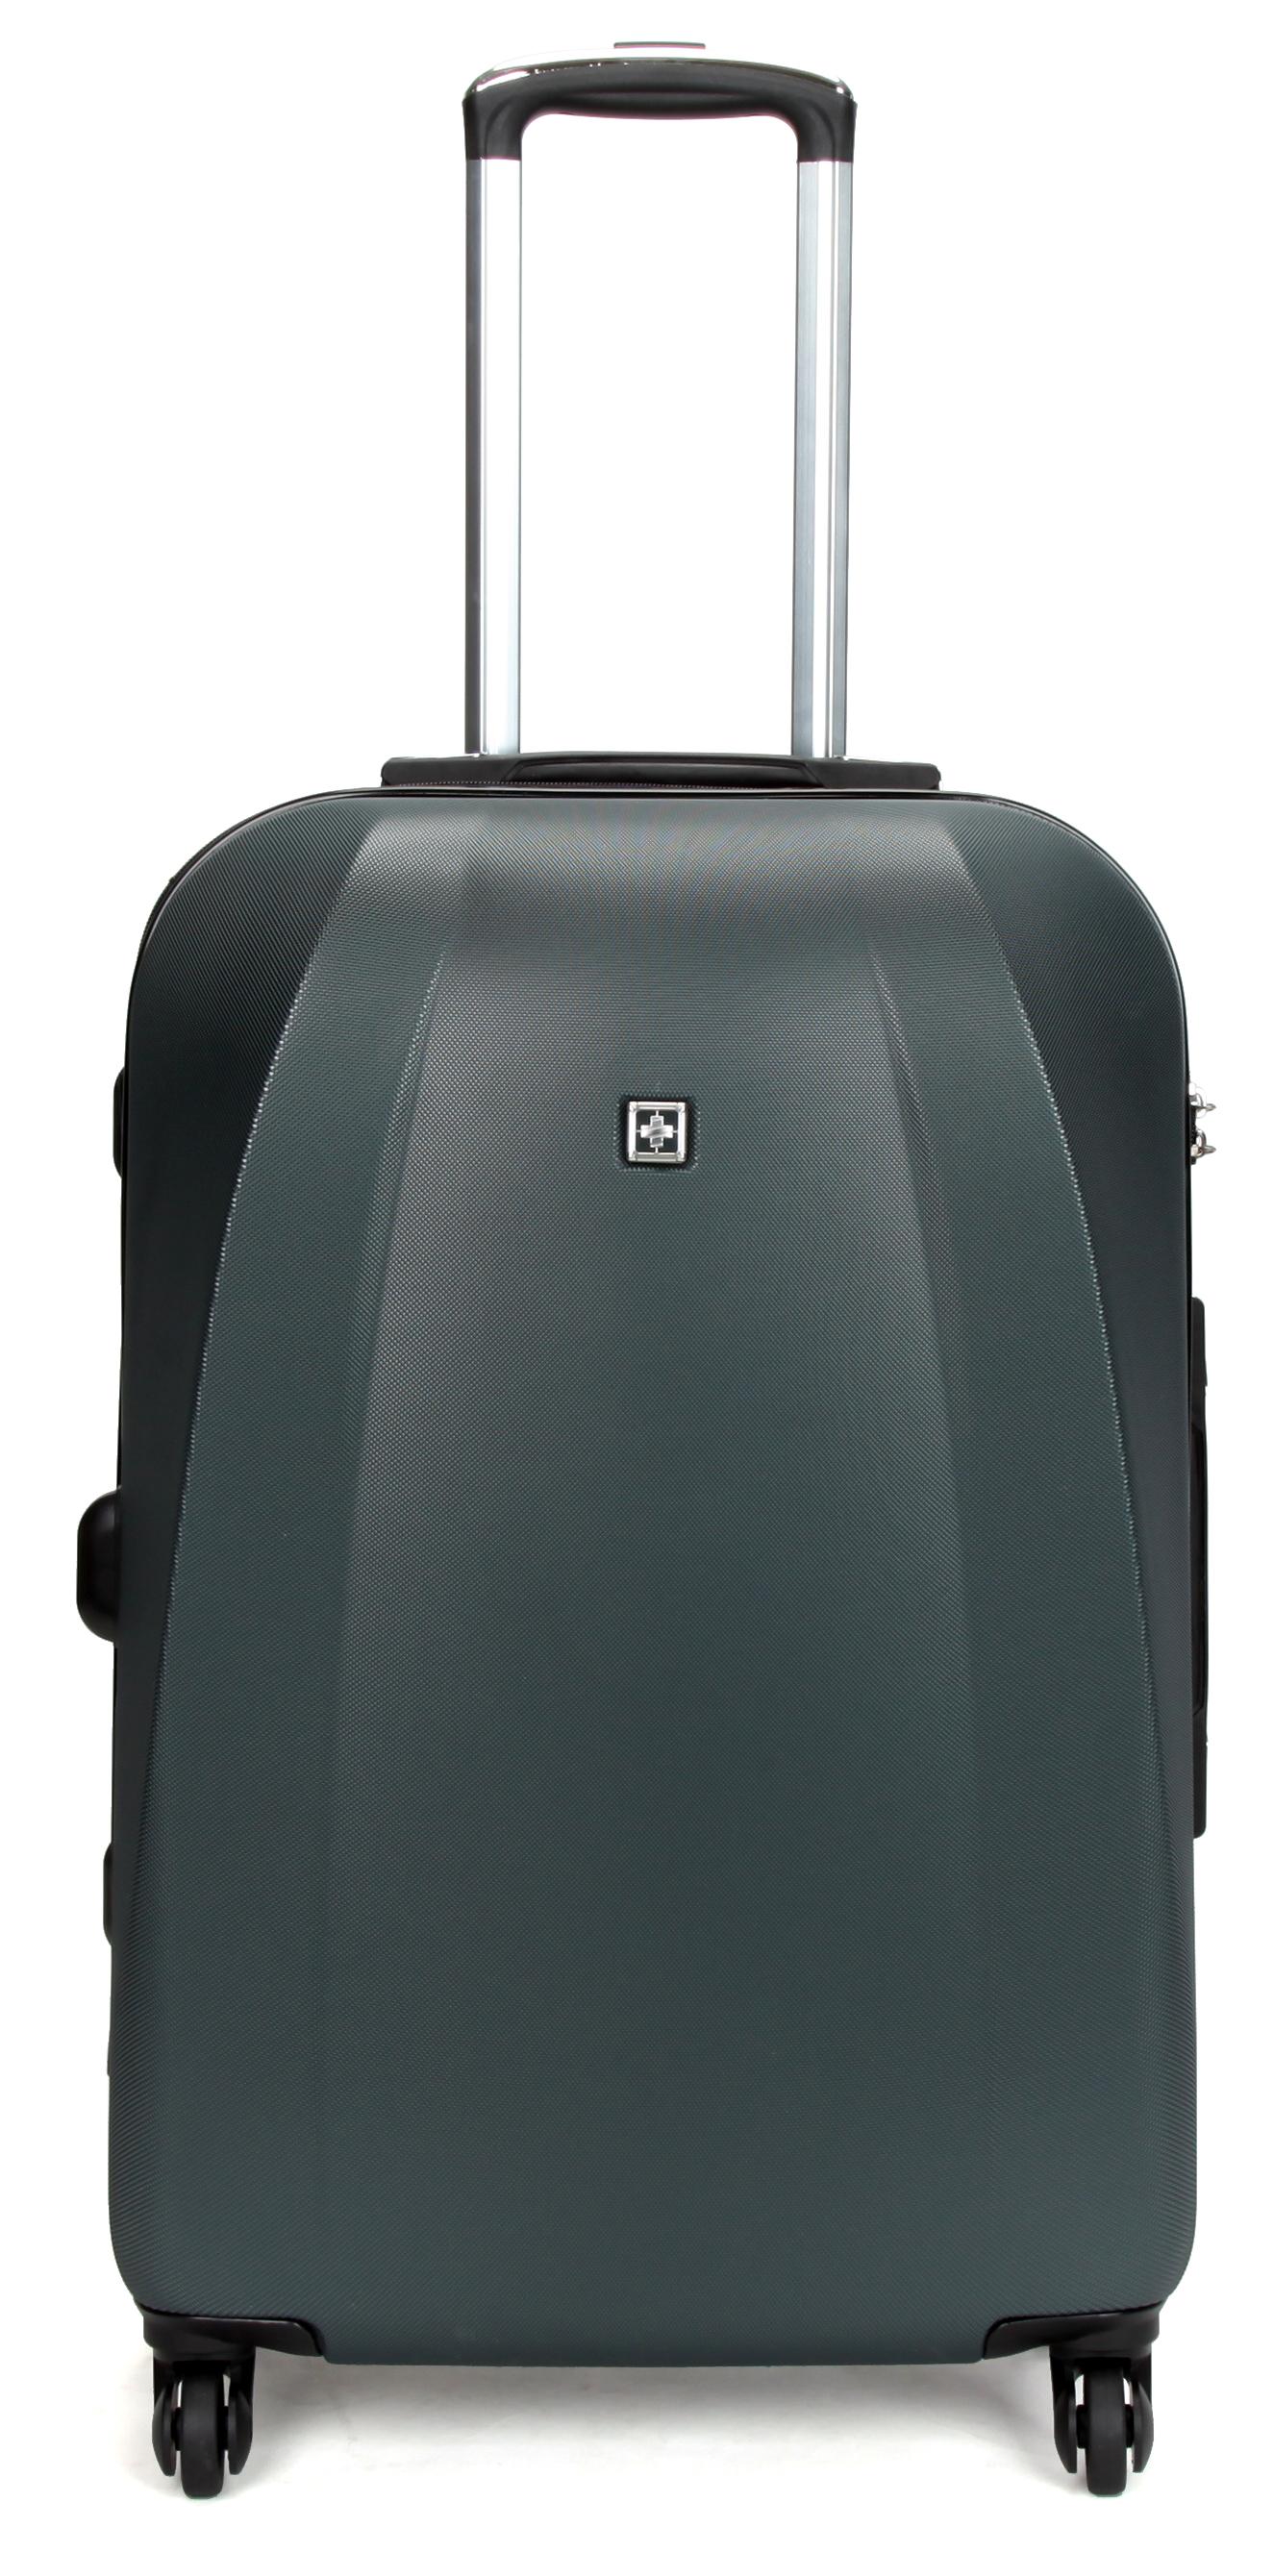 Outdoor Travel Waterproof Luggage